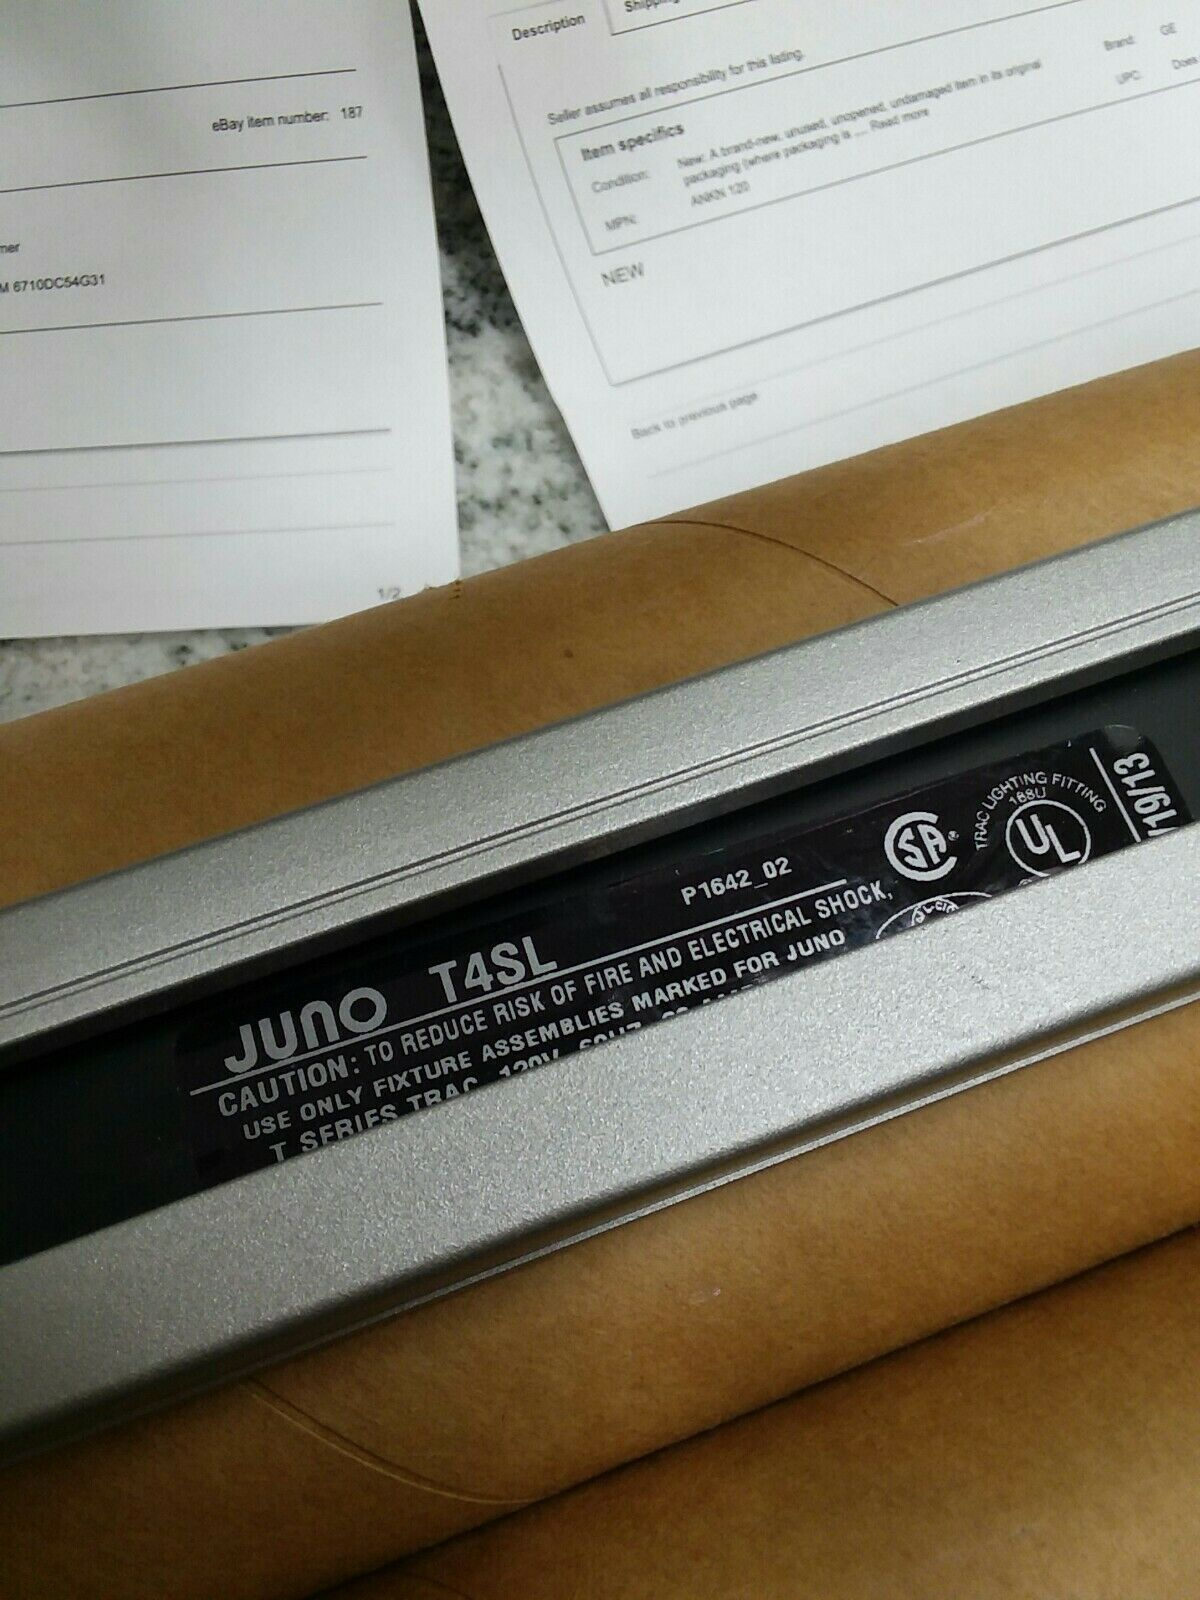 CPC50S//AE50G//CPC50S IDC CABLE Pack of 10 C3PPS-5006G